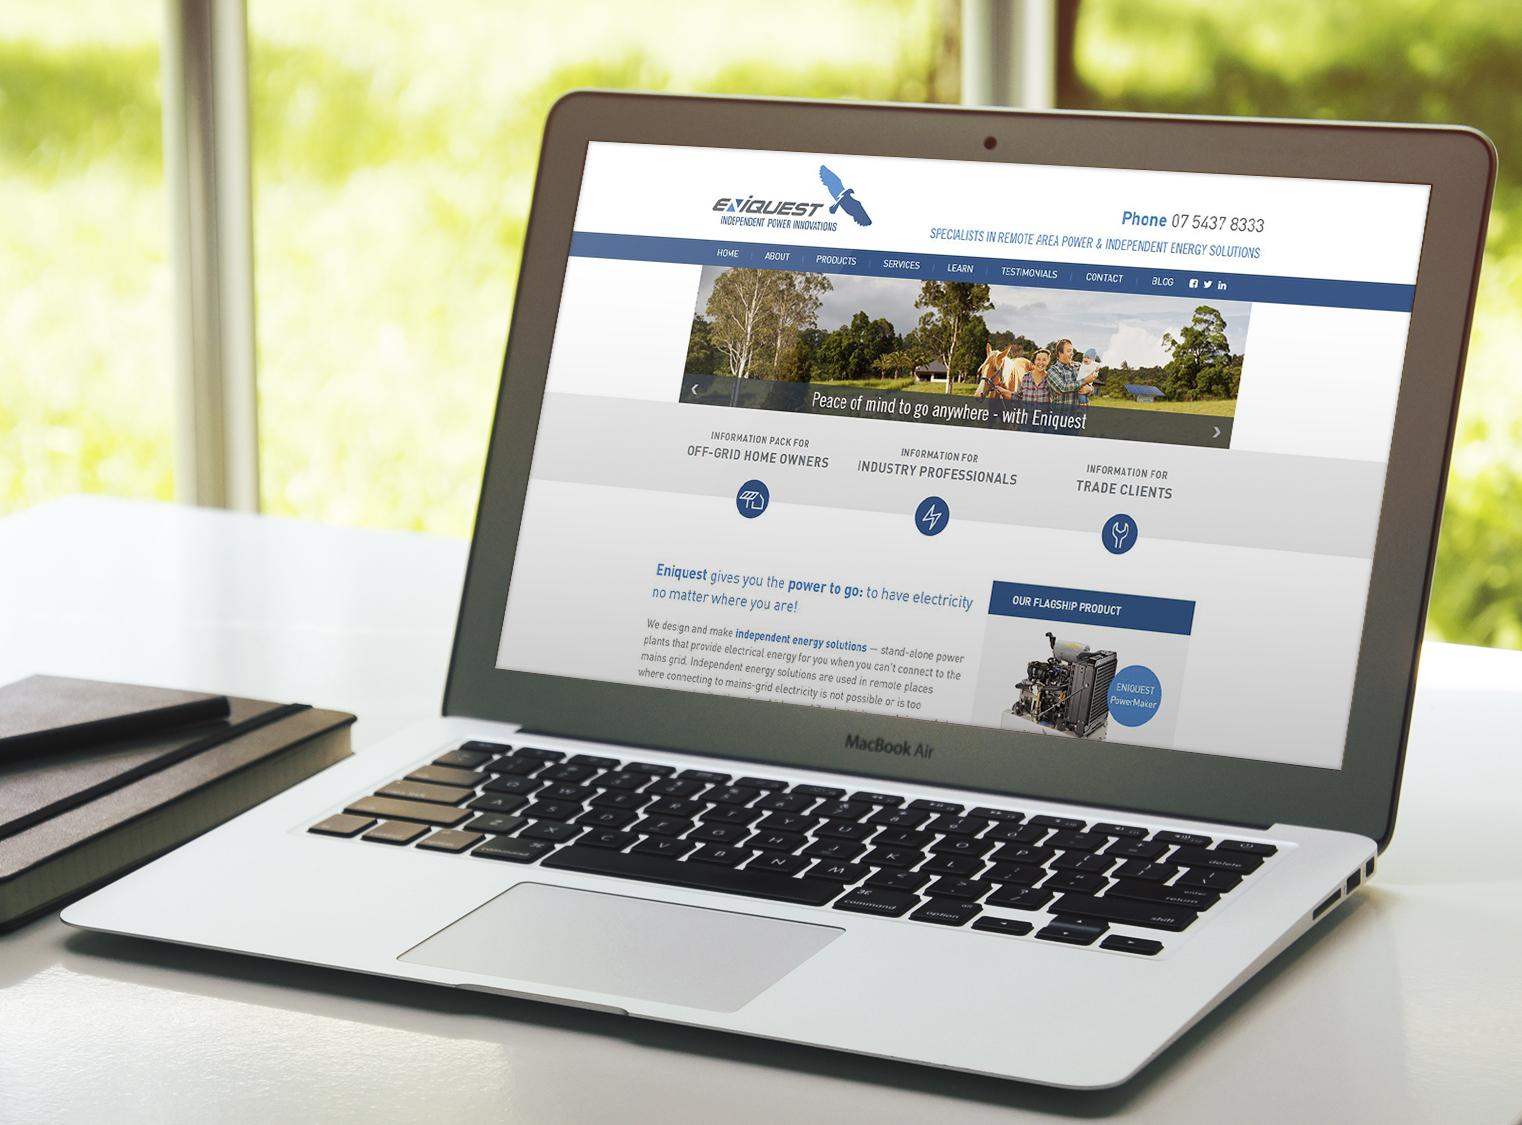 Website copywriting services business